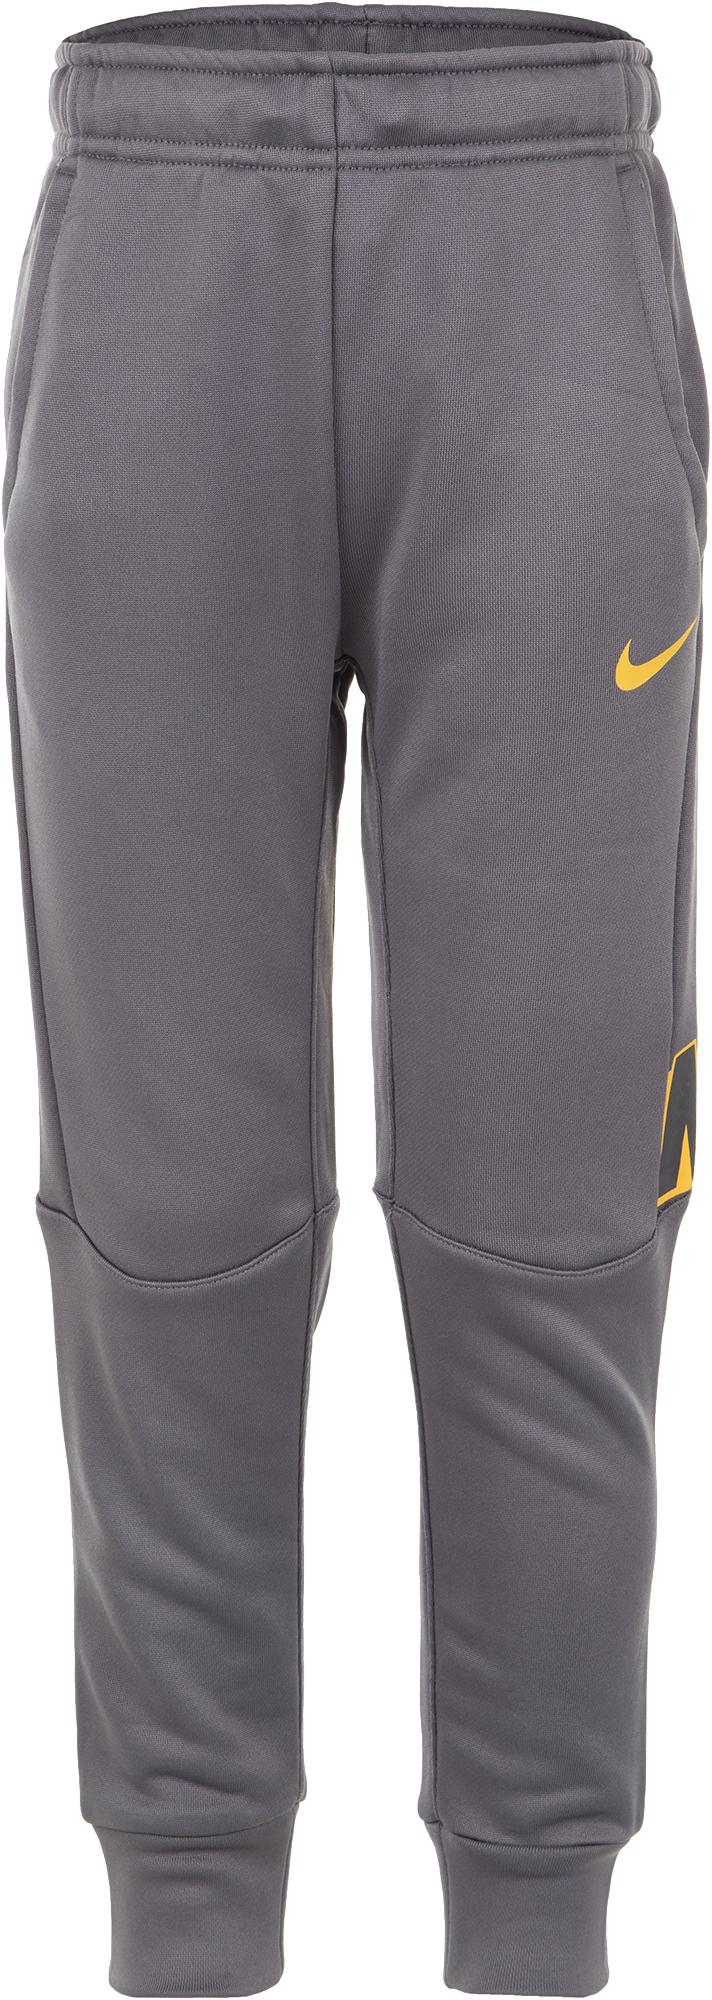 купить Nike Брюки для мальчиков Nike, размер 122 недорого